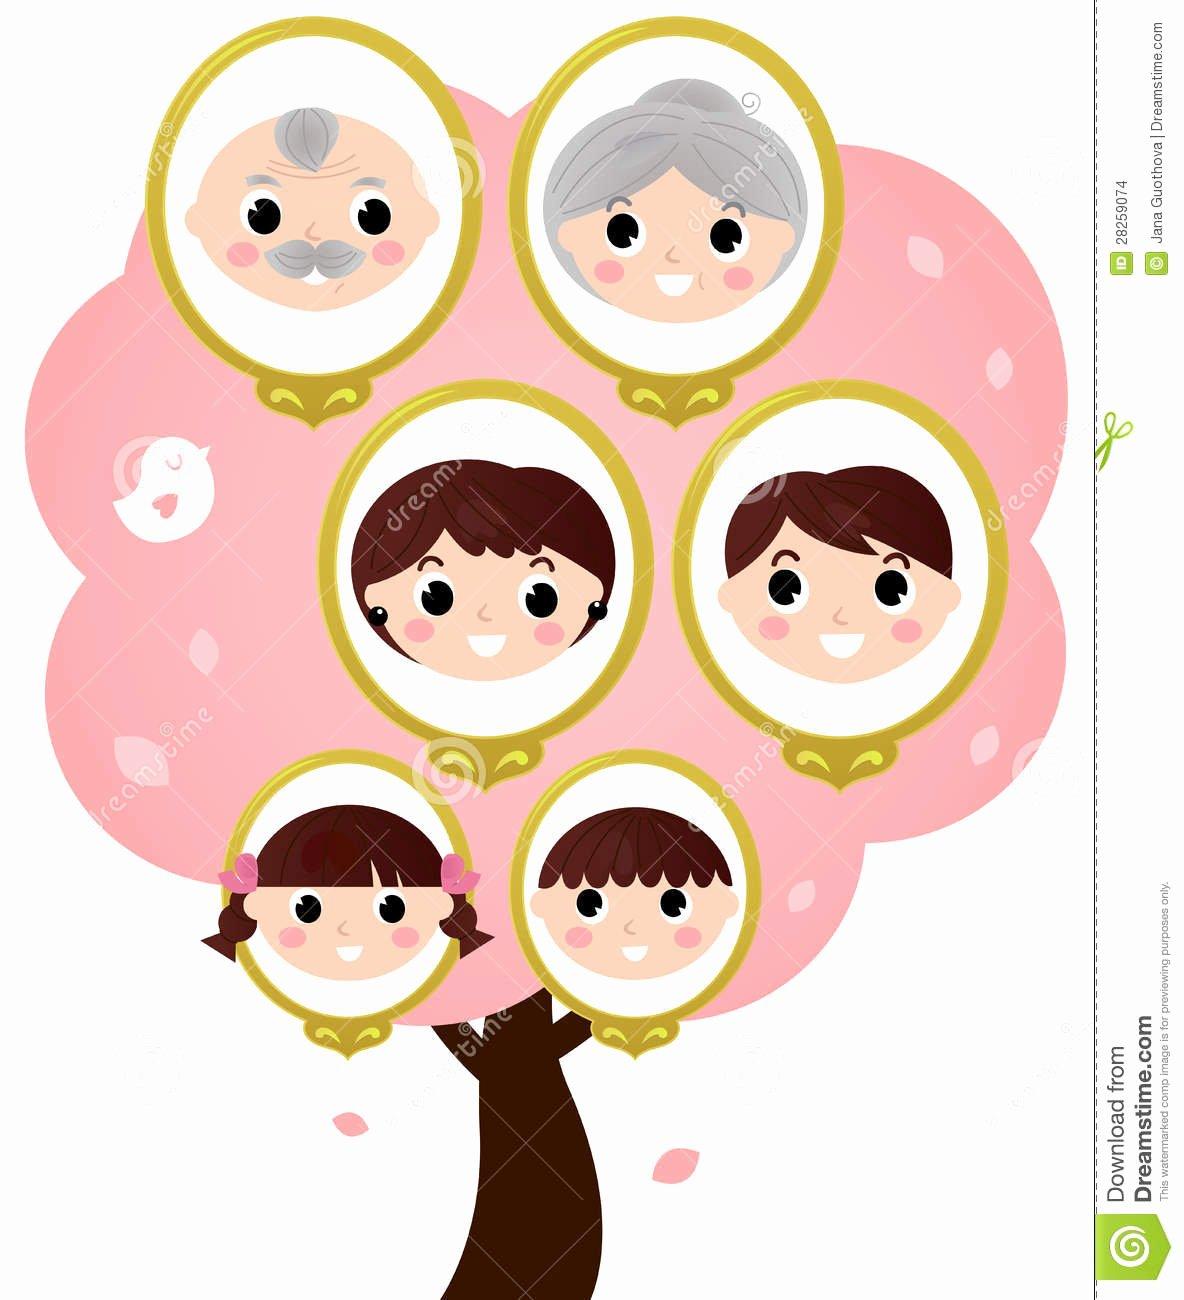 3 Generation Family Trees Elegant Three Generation Family Tree Stock Vector Illustration Of Beauty Classical